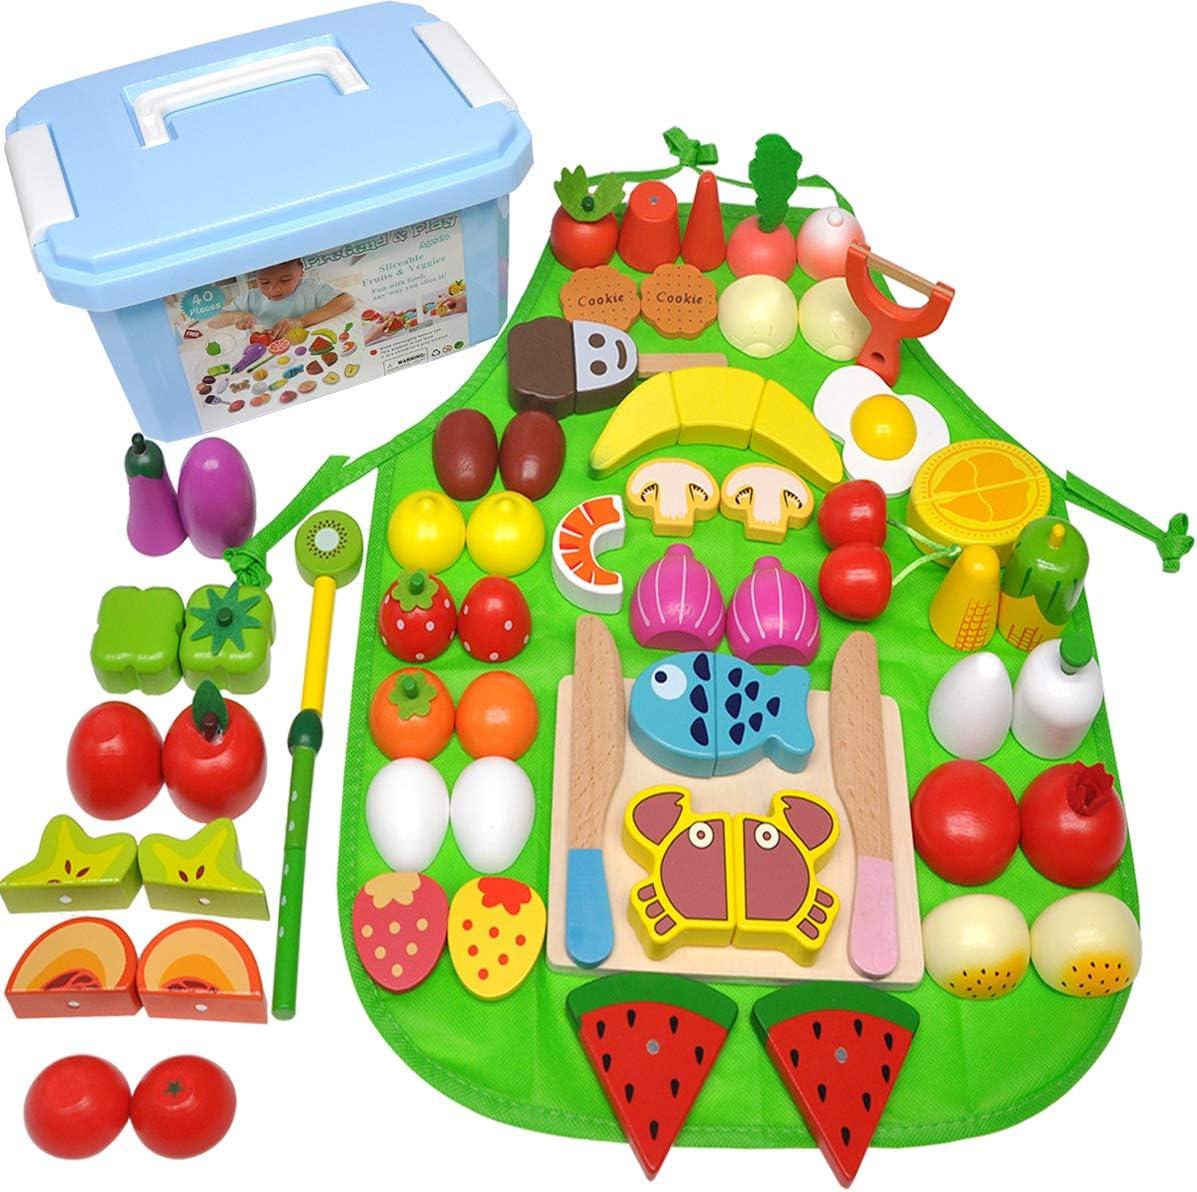 GYBBER&MUMU Play Food Set 40 Pieces,100% Wood Play Kitchen Set Pretend Food Playset Toys